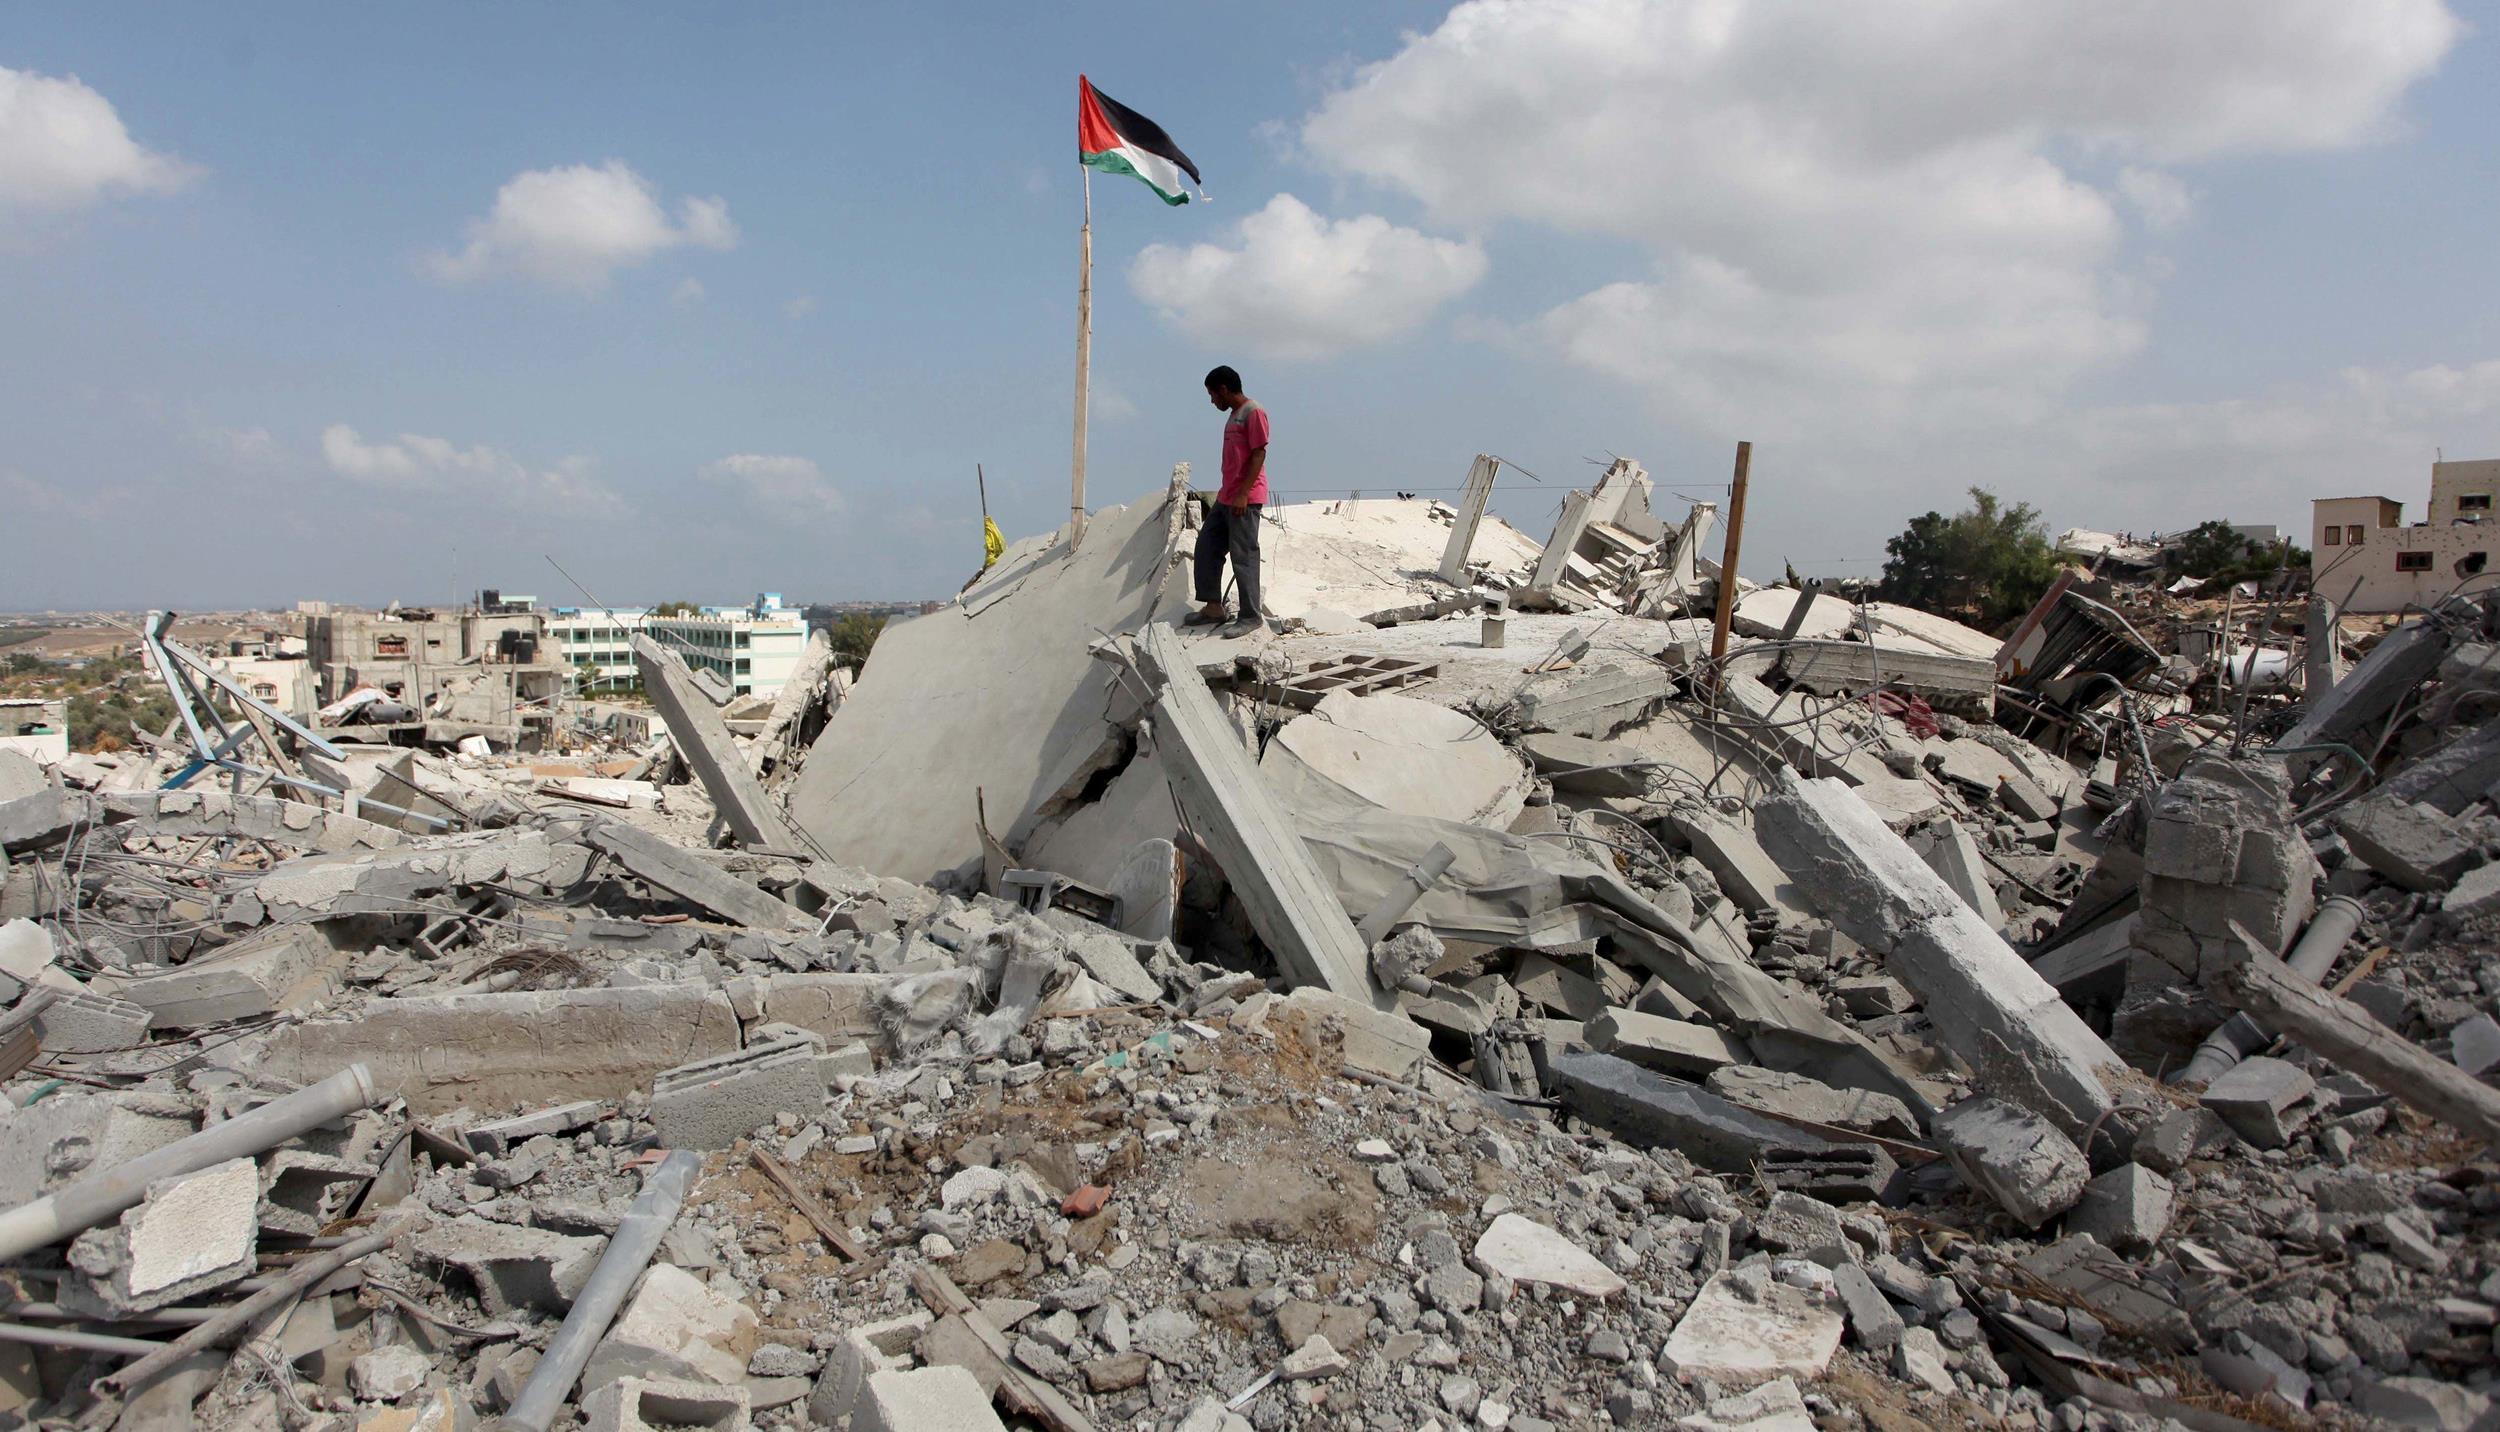 Image: Palestinians among the destroyed buildings in Gaza's Johr al-Deek